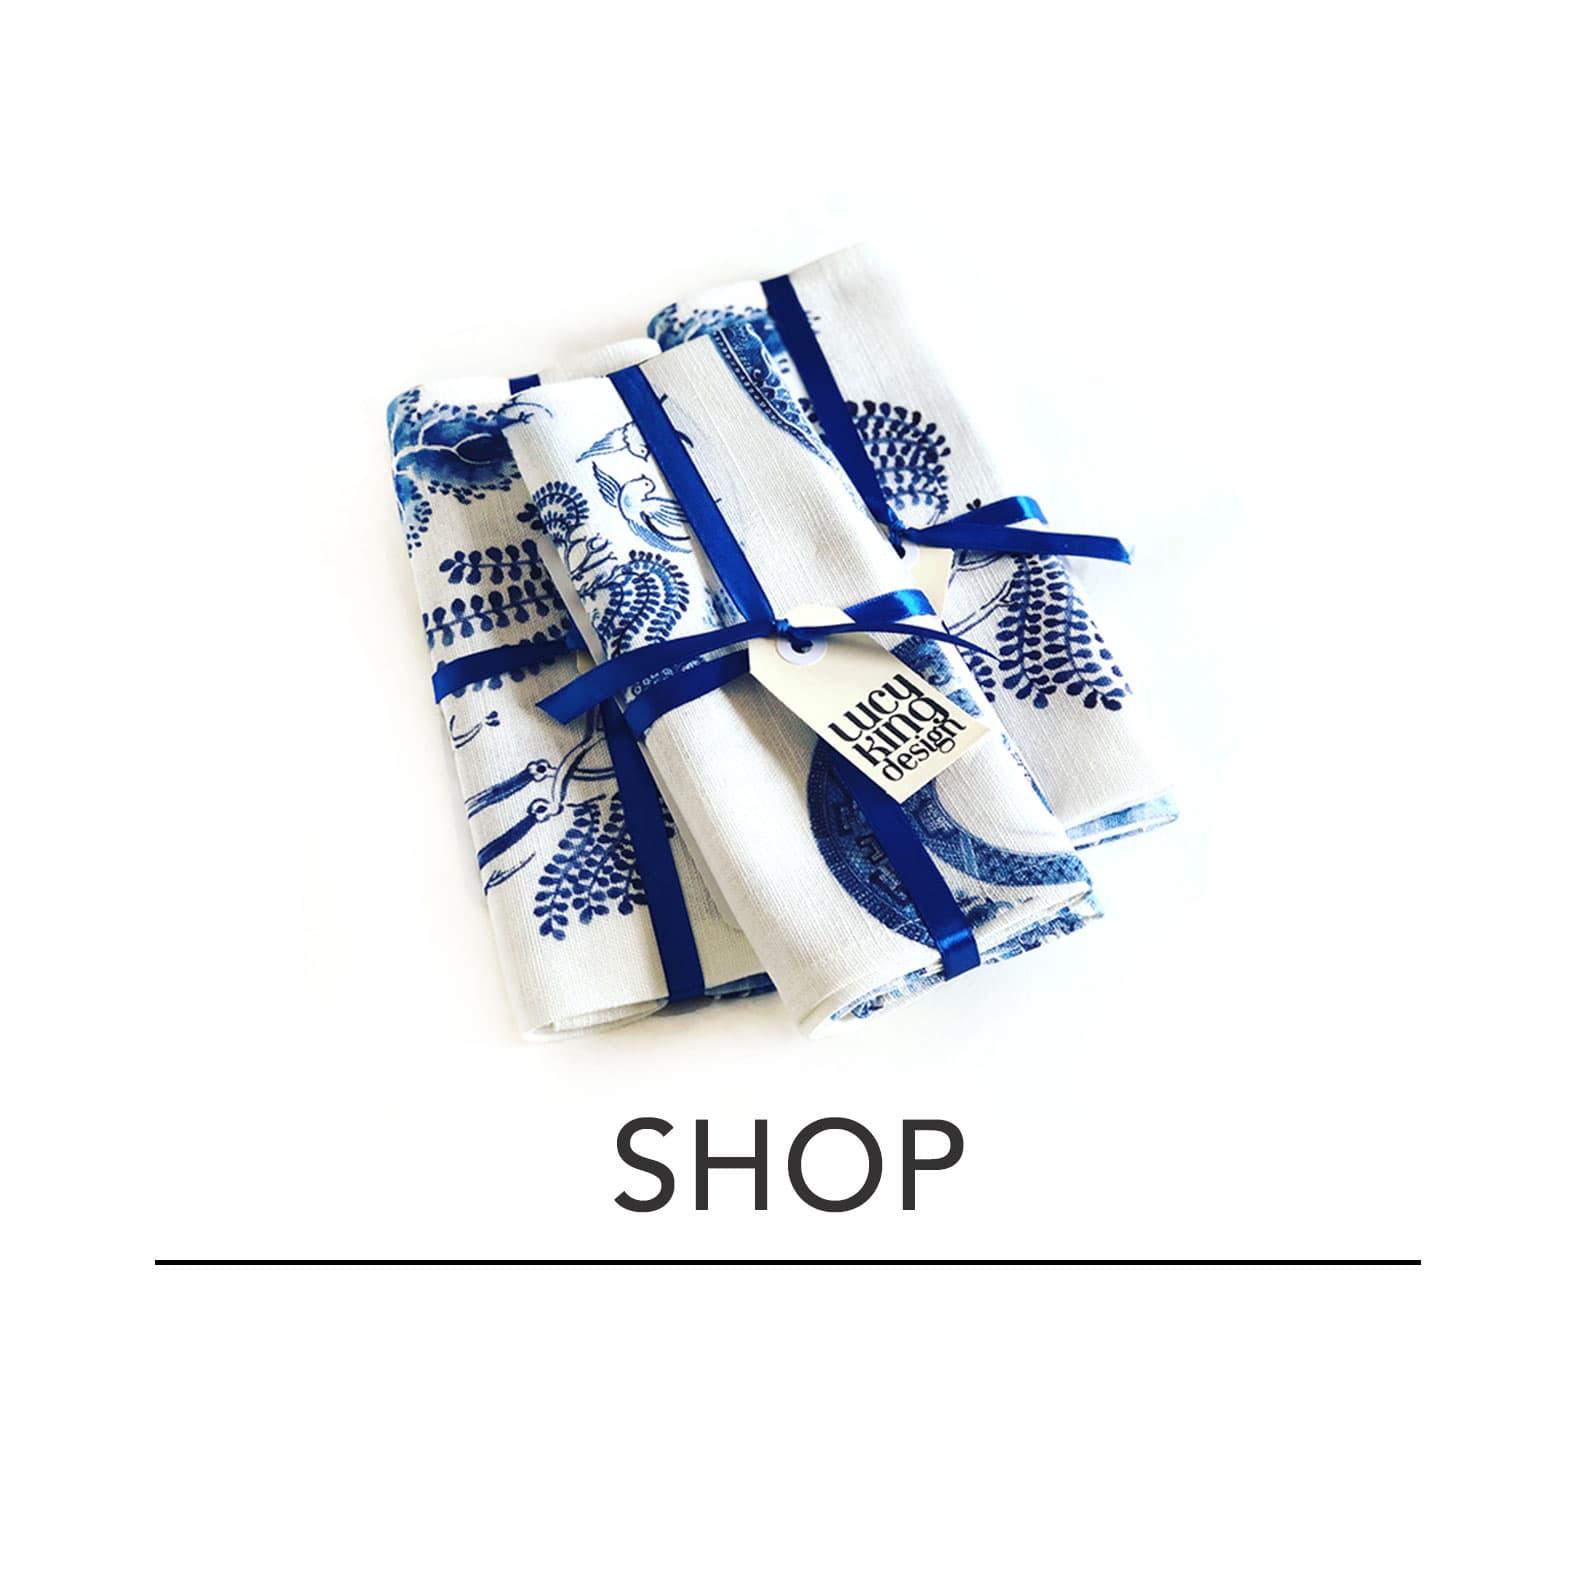 Shop-5A.jpg